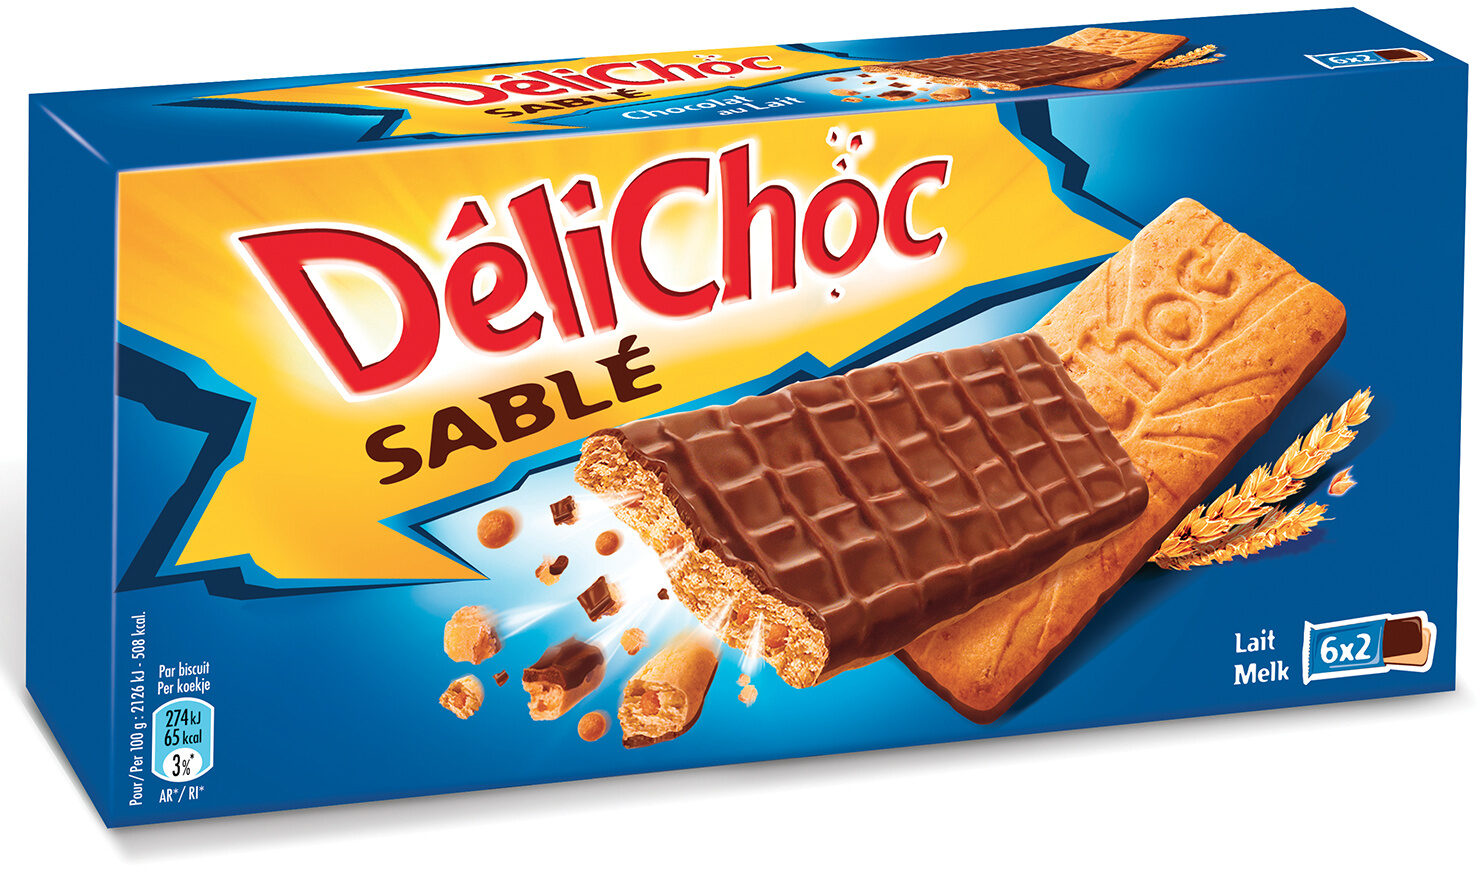 Delichoc sable chocolat lait - Prodotto - fr